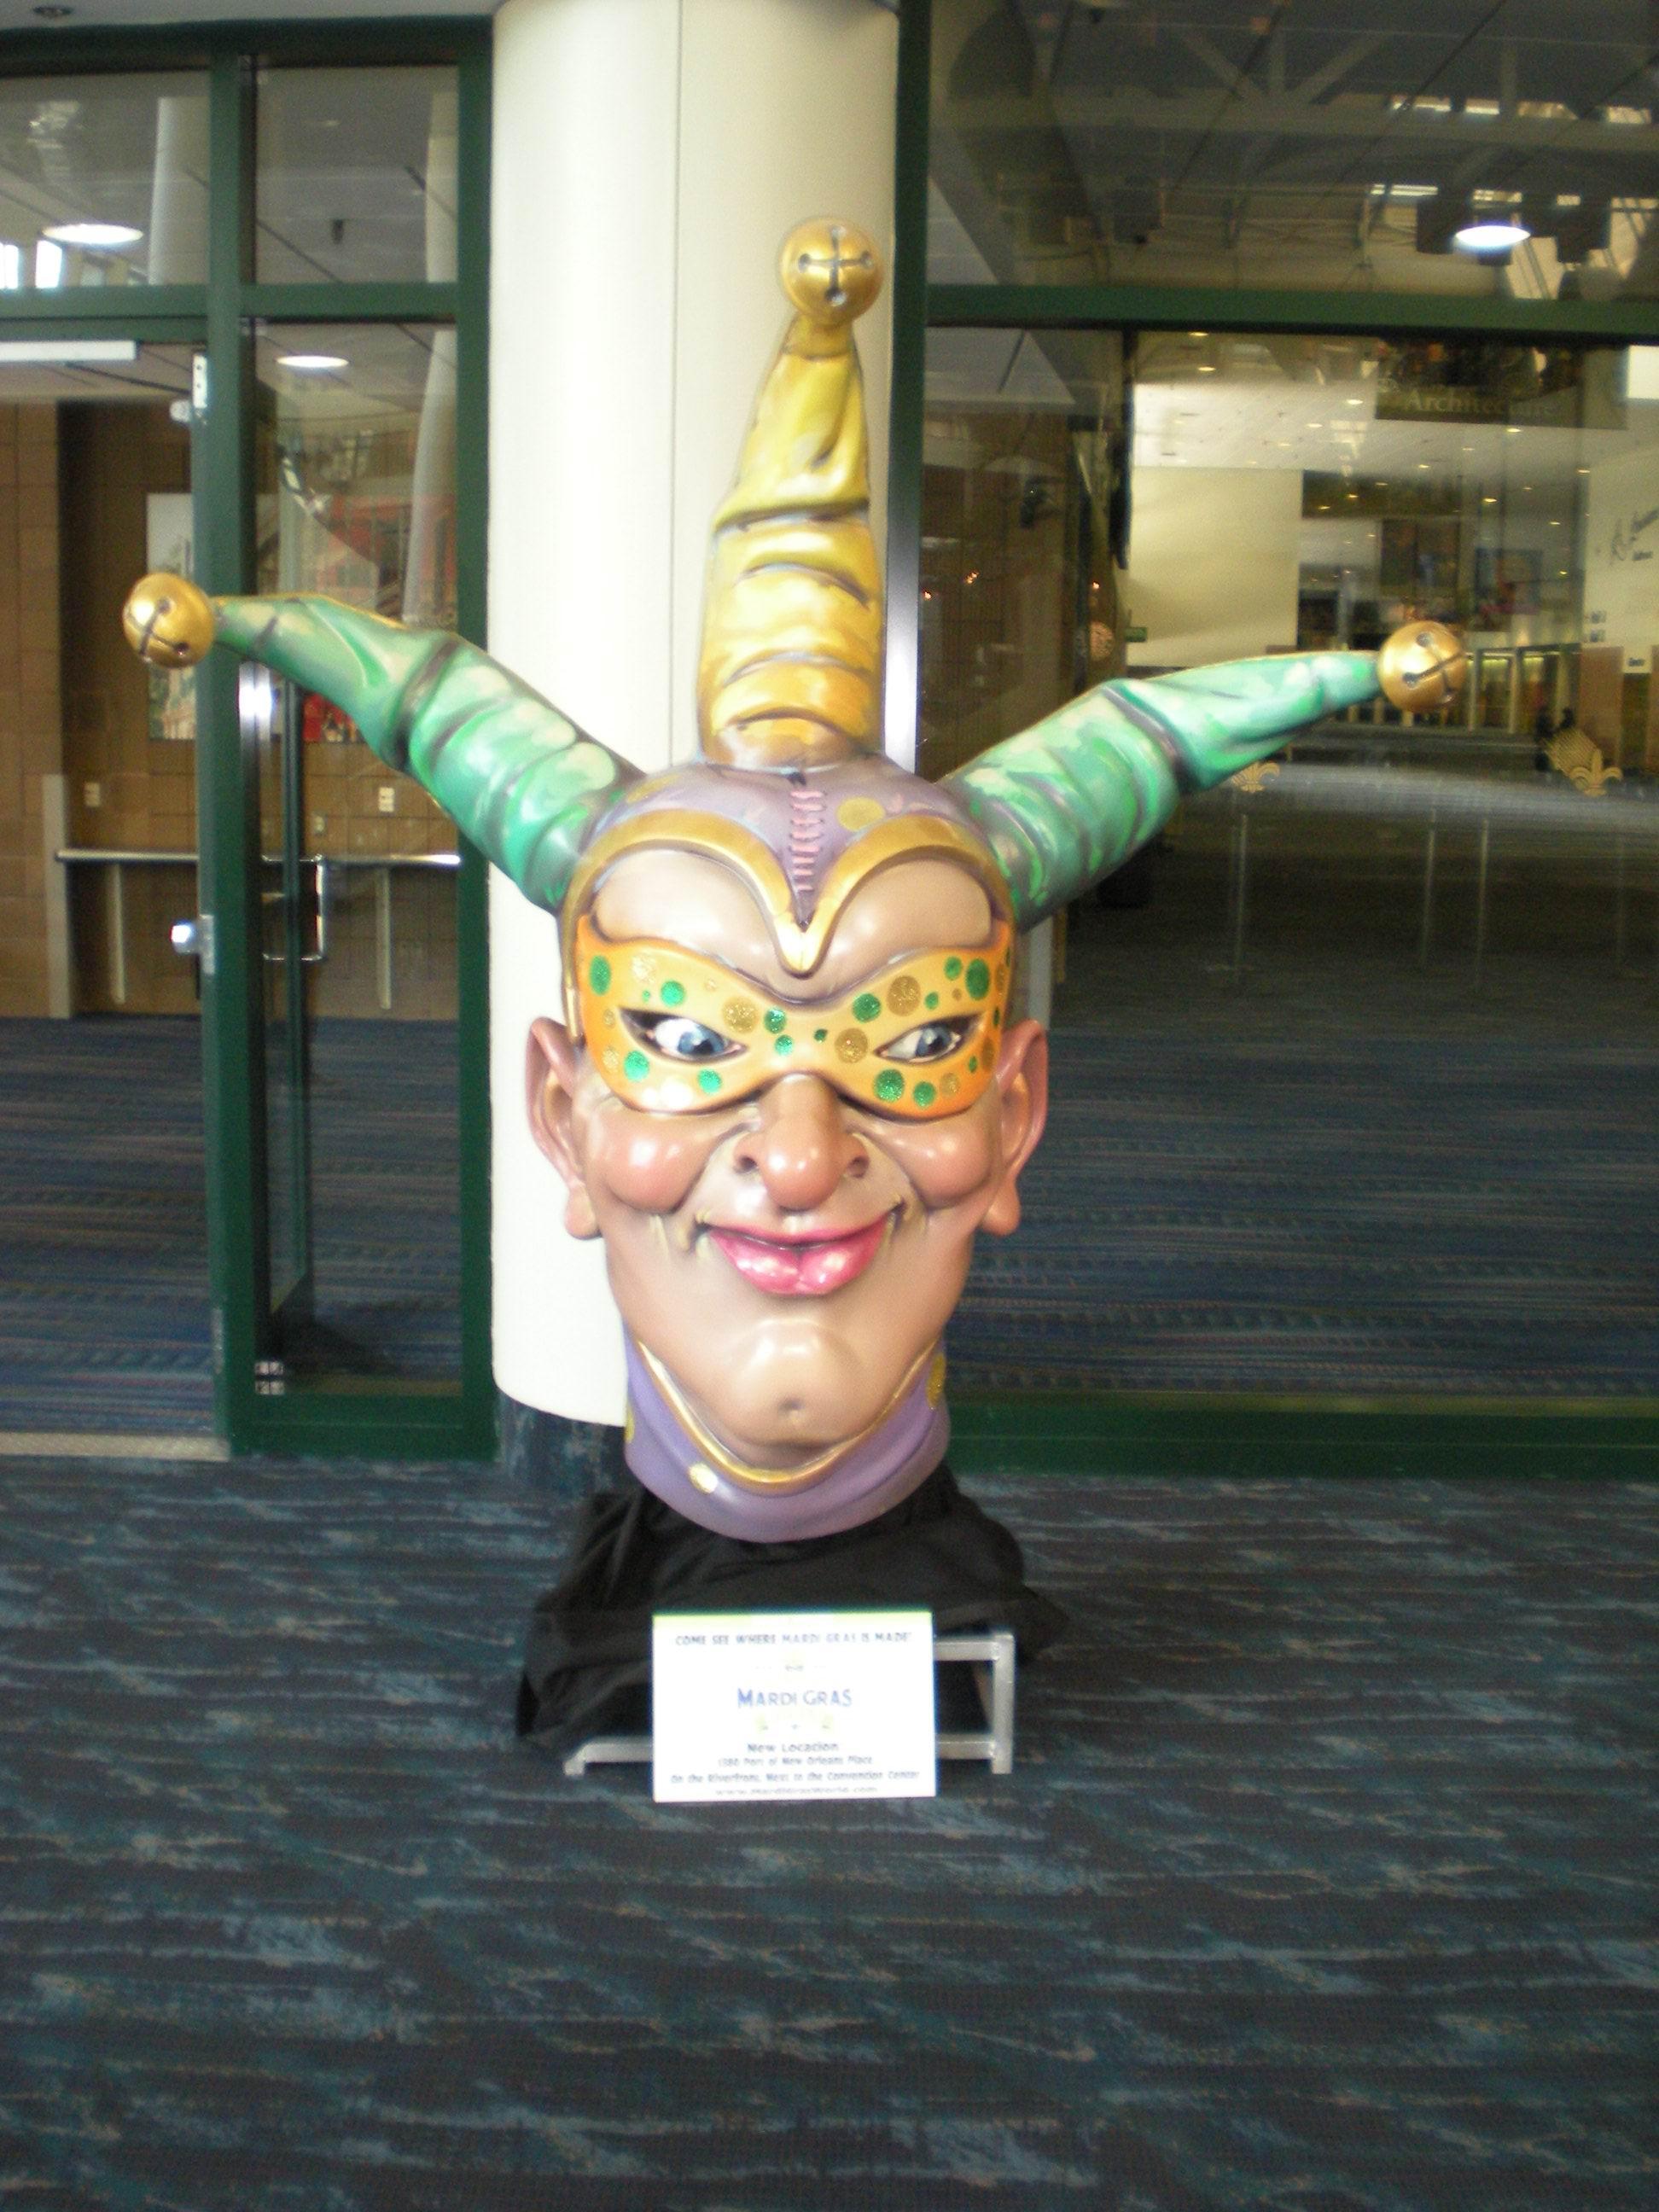 Mardi gras jester head photo